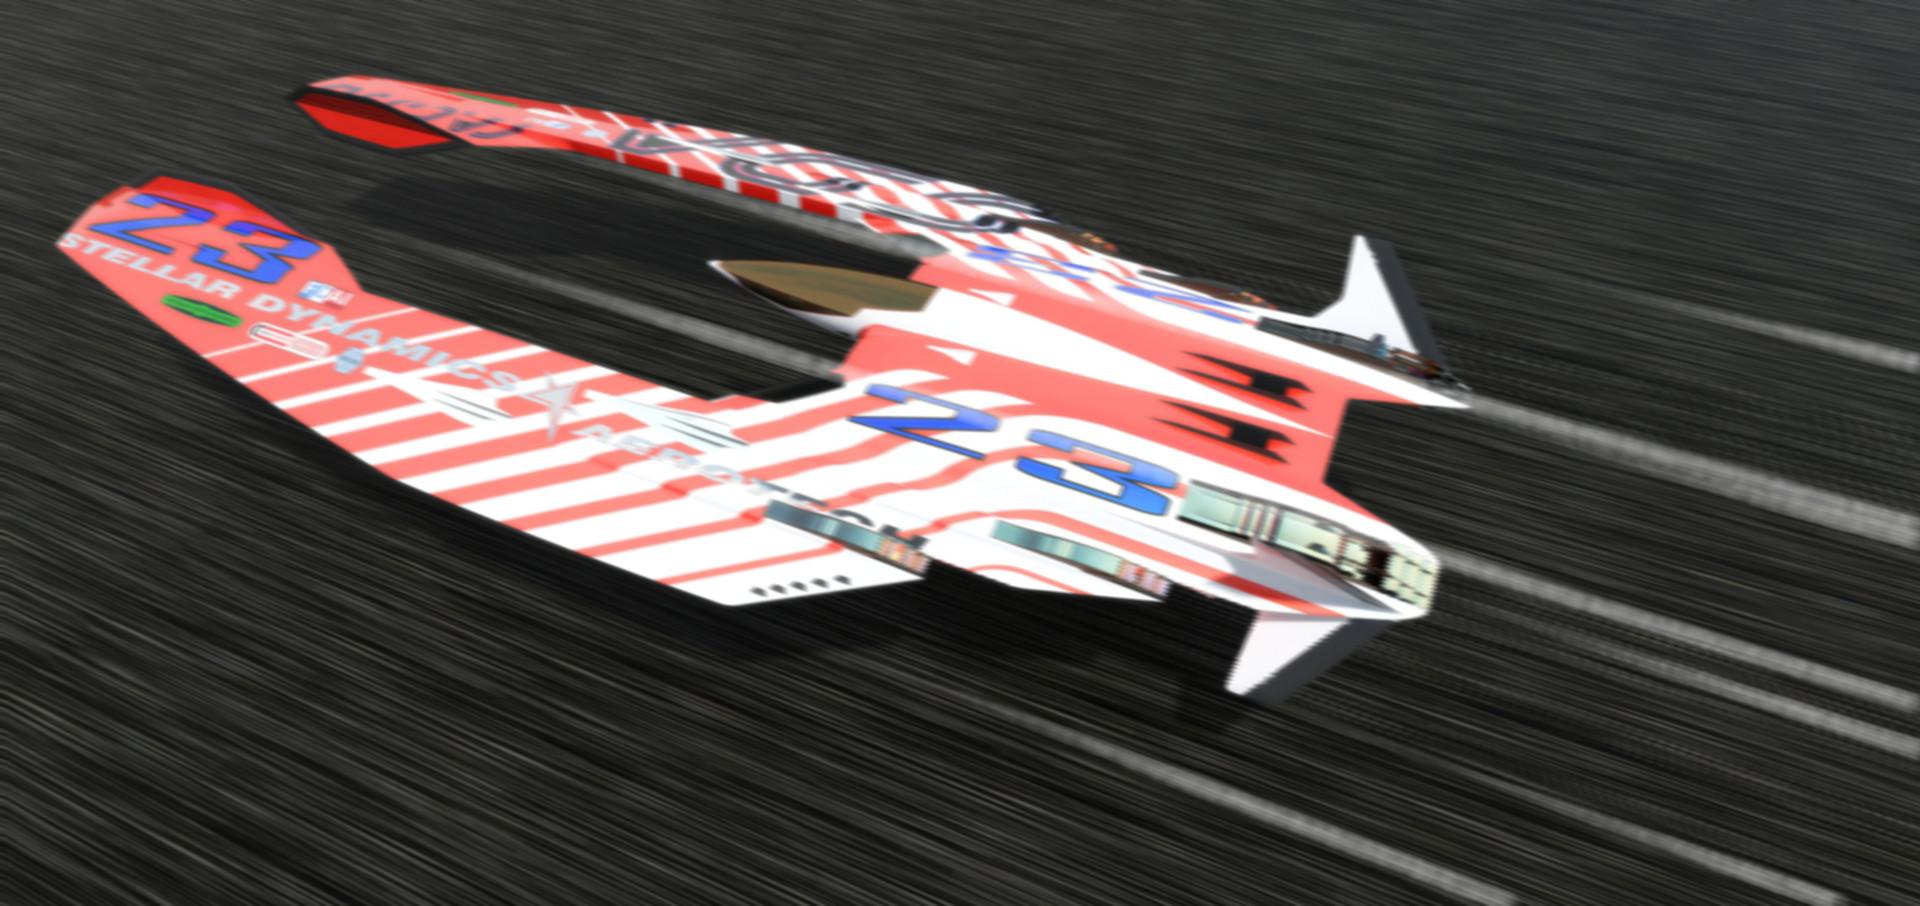 Joachim sverd martian aeroracer24 speed